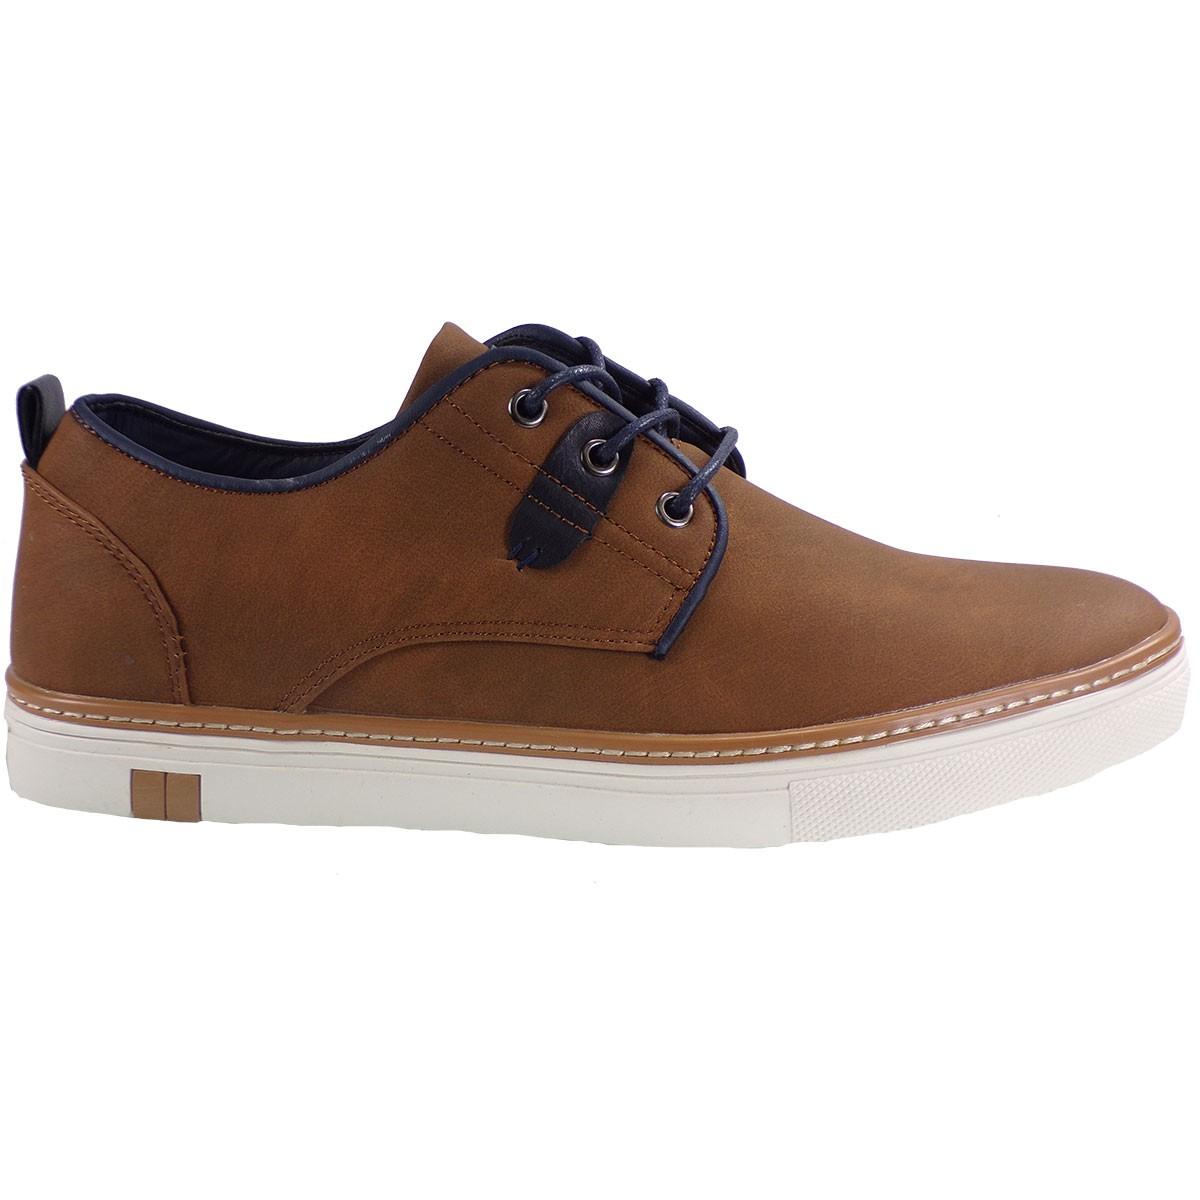 3f9765c7a85 Calgary Ανδρικά Παπούτσια Sneakers Α1001 Ταμπά Ι57001111581 – IShoeStore